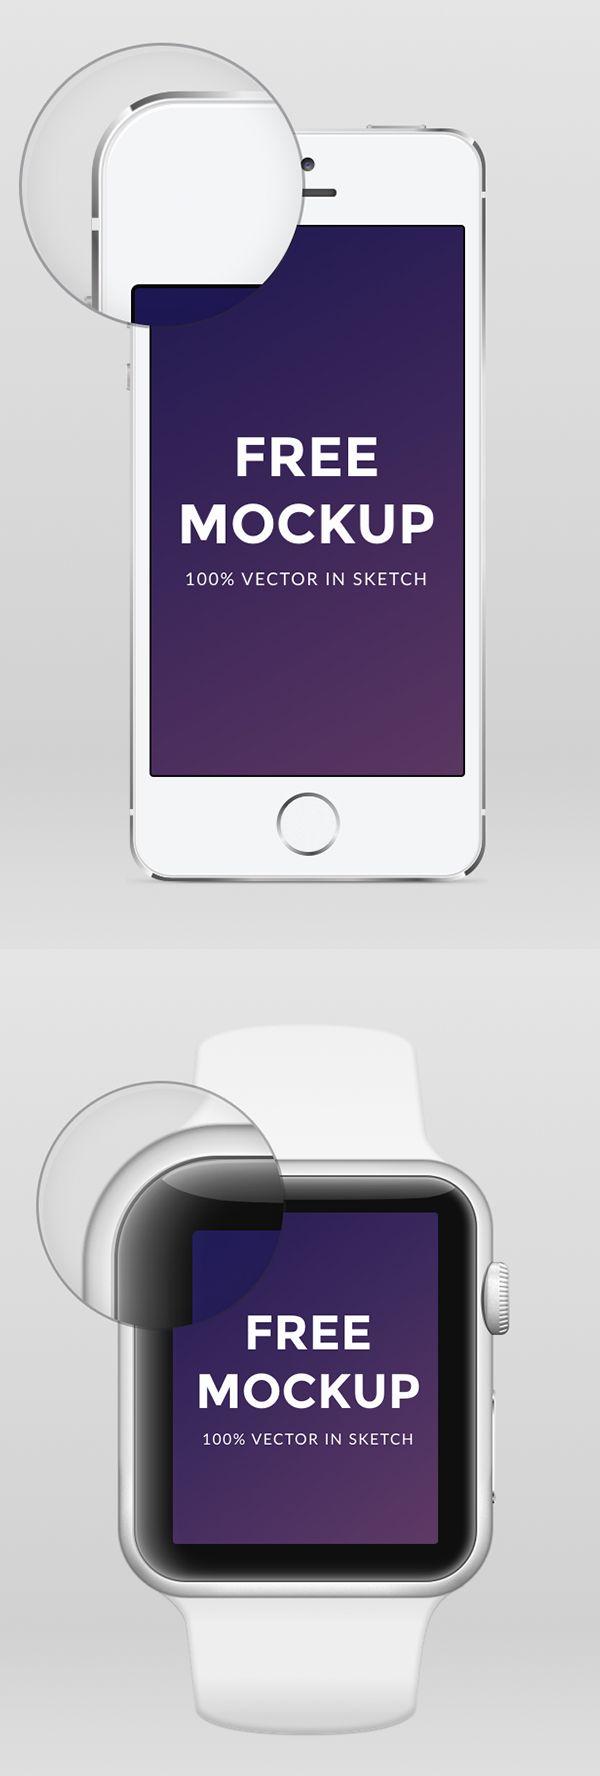 Free Apple Watch iPhone 6 & iPhone 5 .sketch Mockup #freebies #freepsdfiles #freepsdmockups #psdtemplates #businesscards